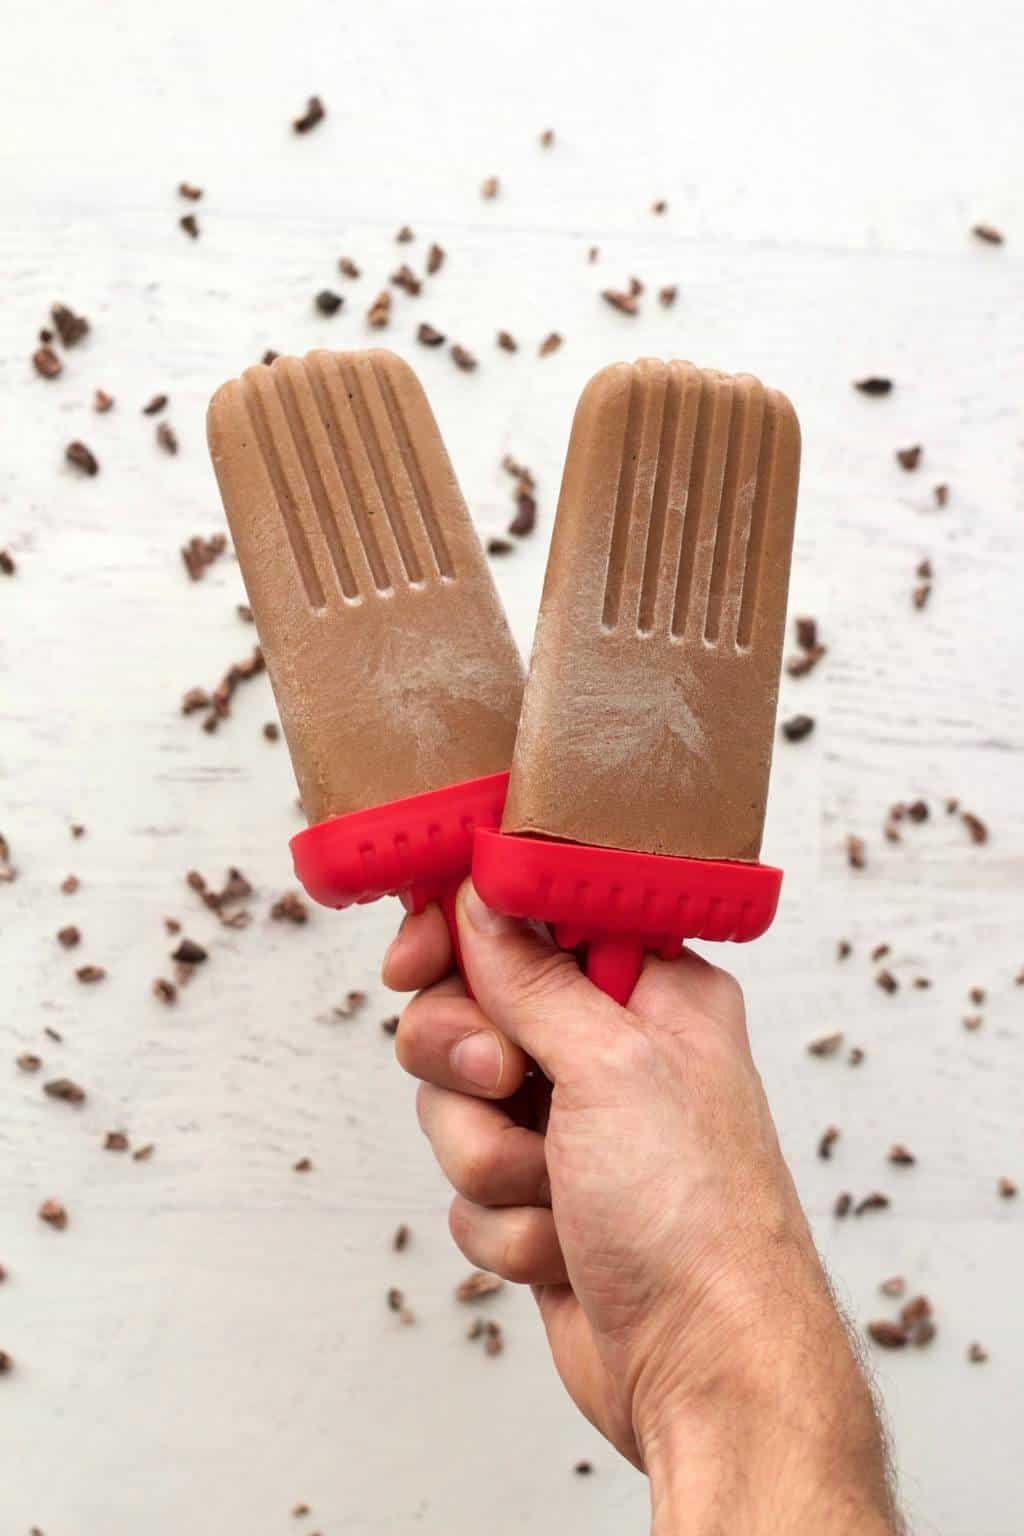 Vegan Dark Chocolate Popsicles #vegan #lovingitvegan #chocolatepopsicles #dessert #snack #glutenfree #dairyfree